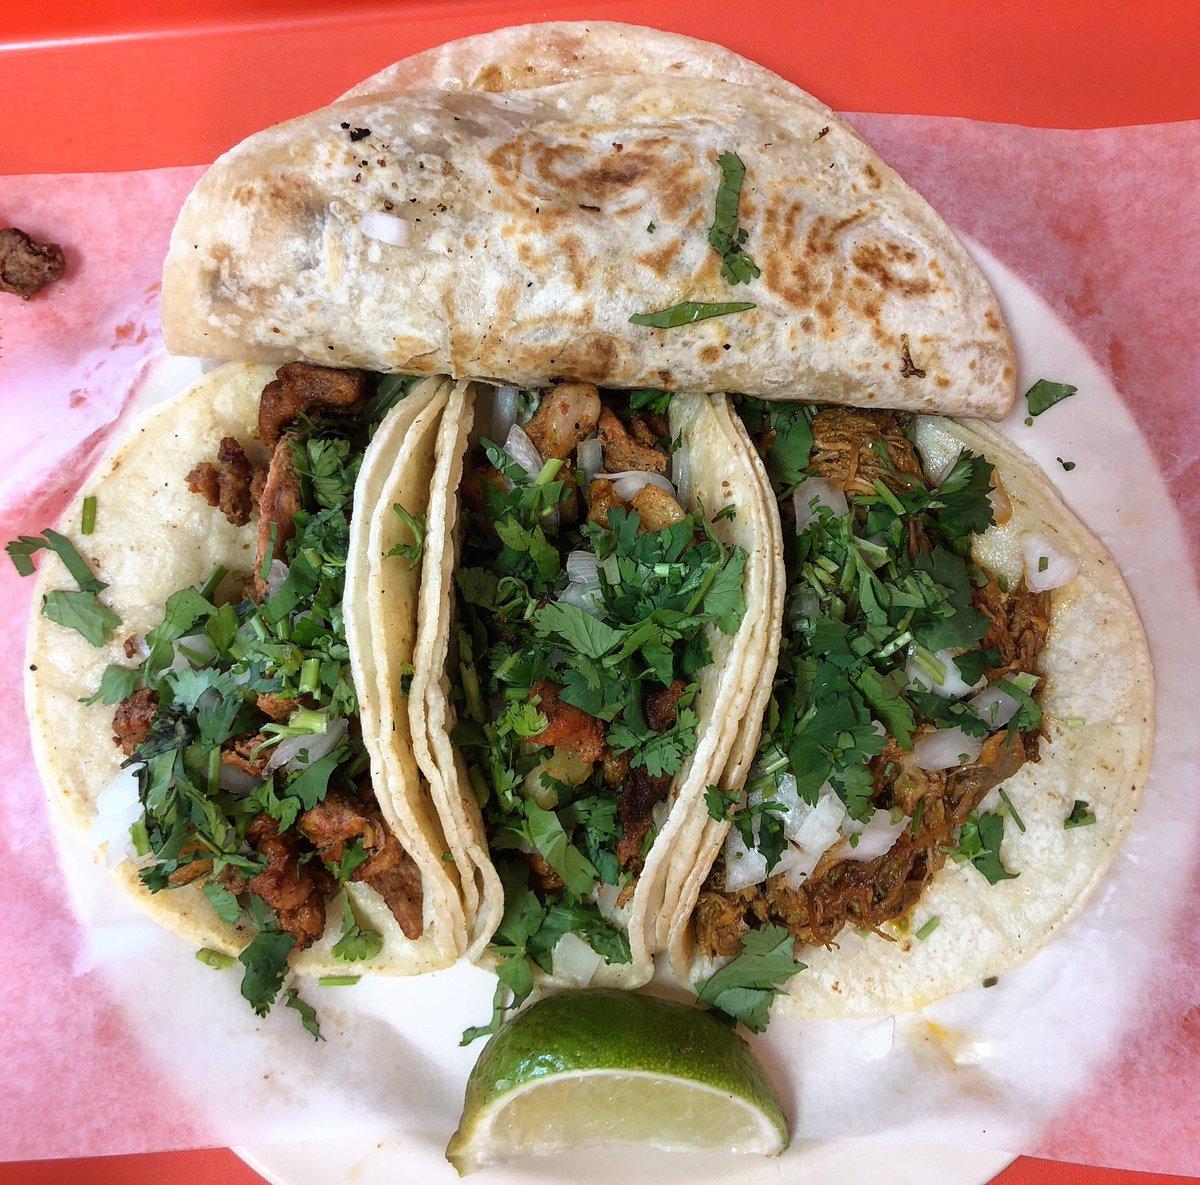 The Cochinita Pibil was #bienlit!  . . . #Houston #LaBalaTaqueria #tacos #htxeats #htxtacos #houstontacos #htxfoodie #houstontexas #eeeeeats #foodie #tacopic.twitter.com/RVNPWbrInP – at Tacos La Bala #2